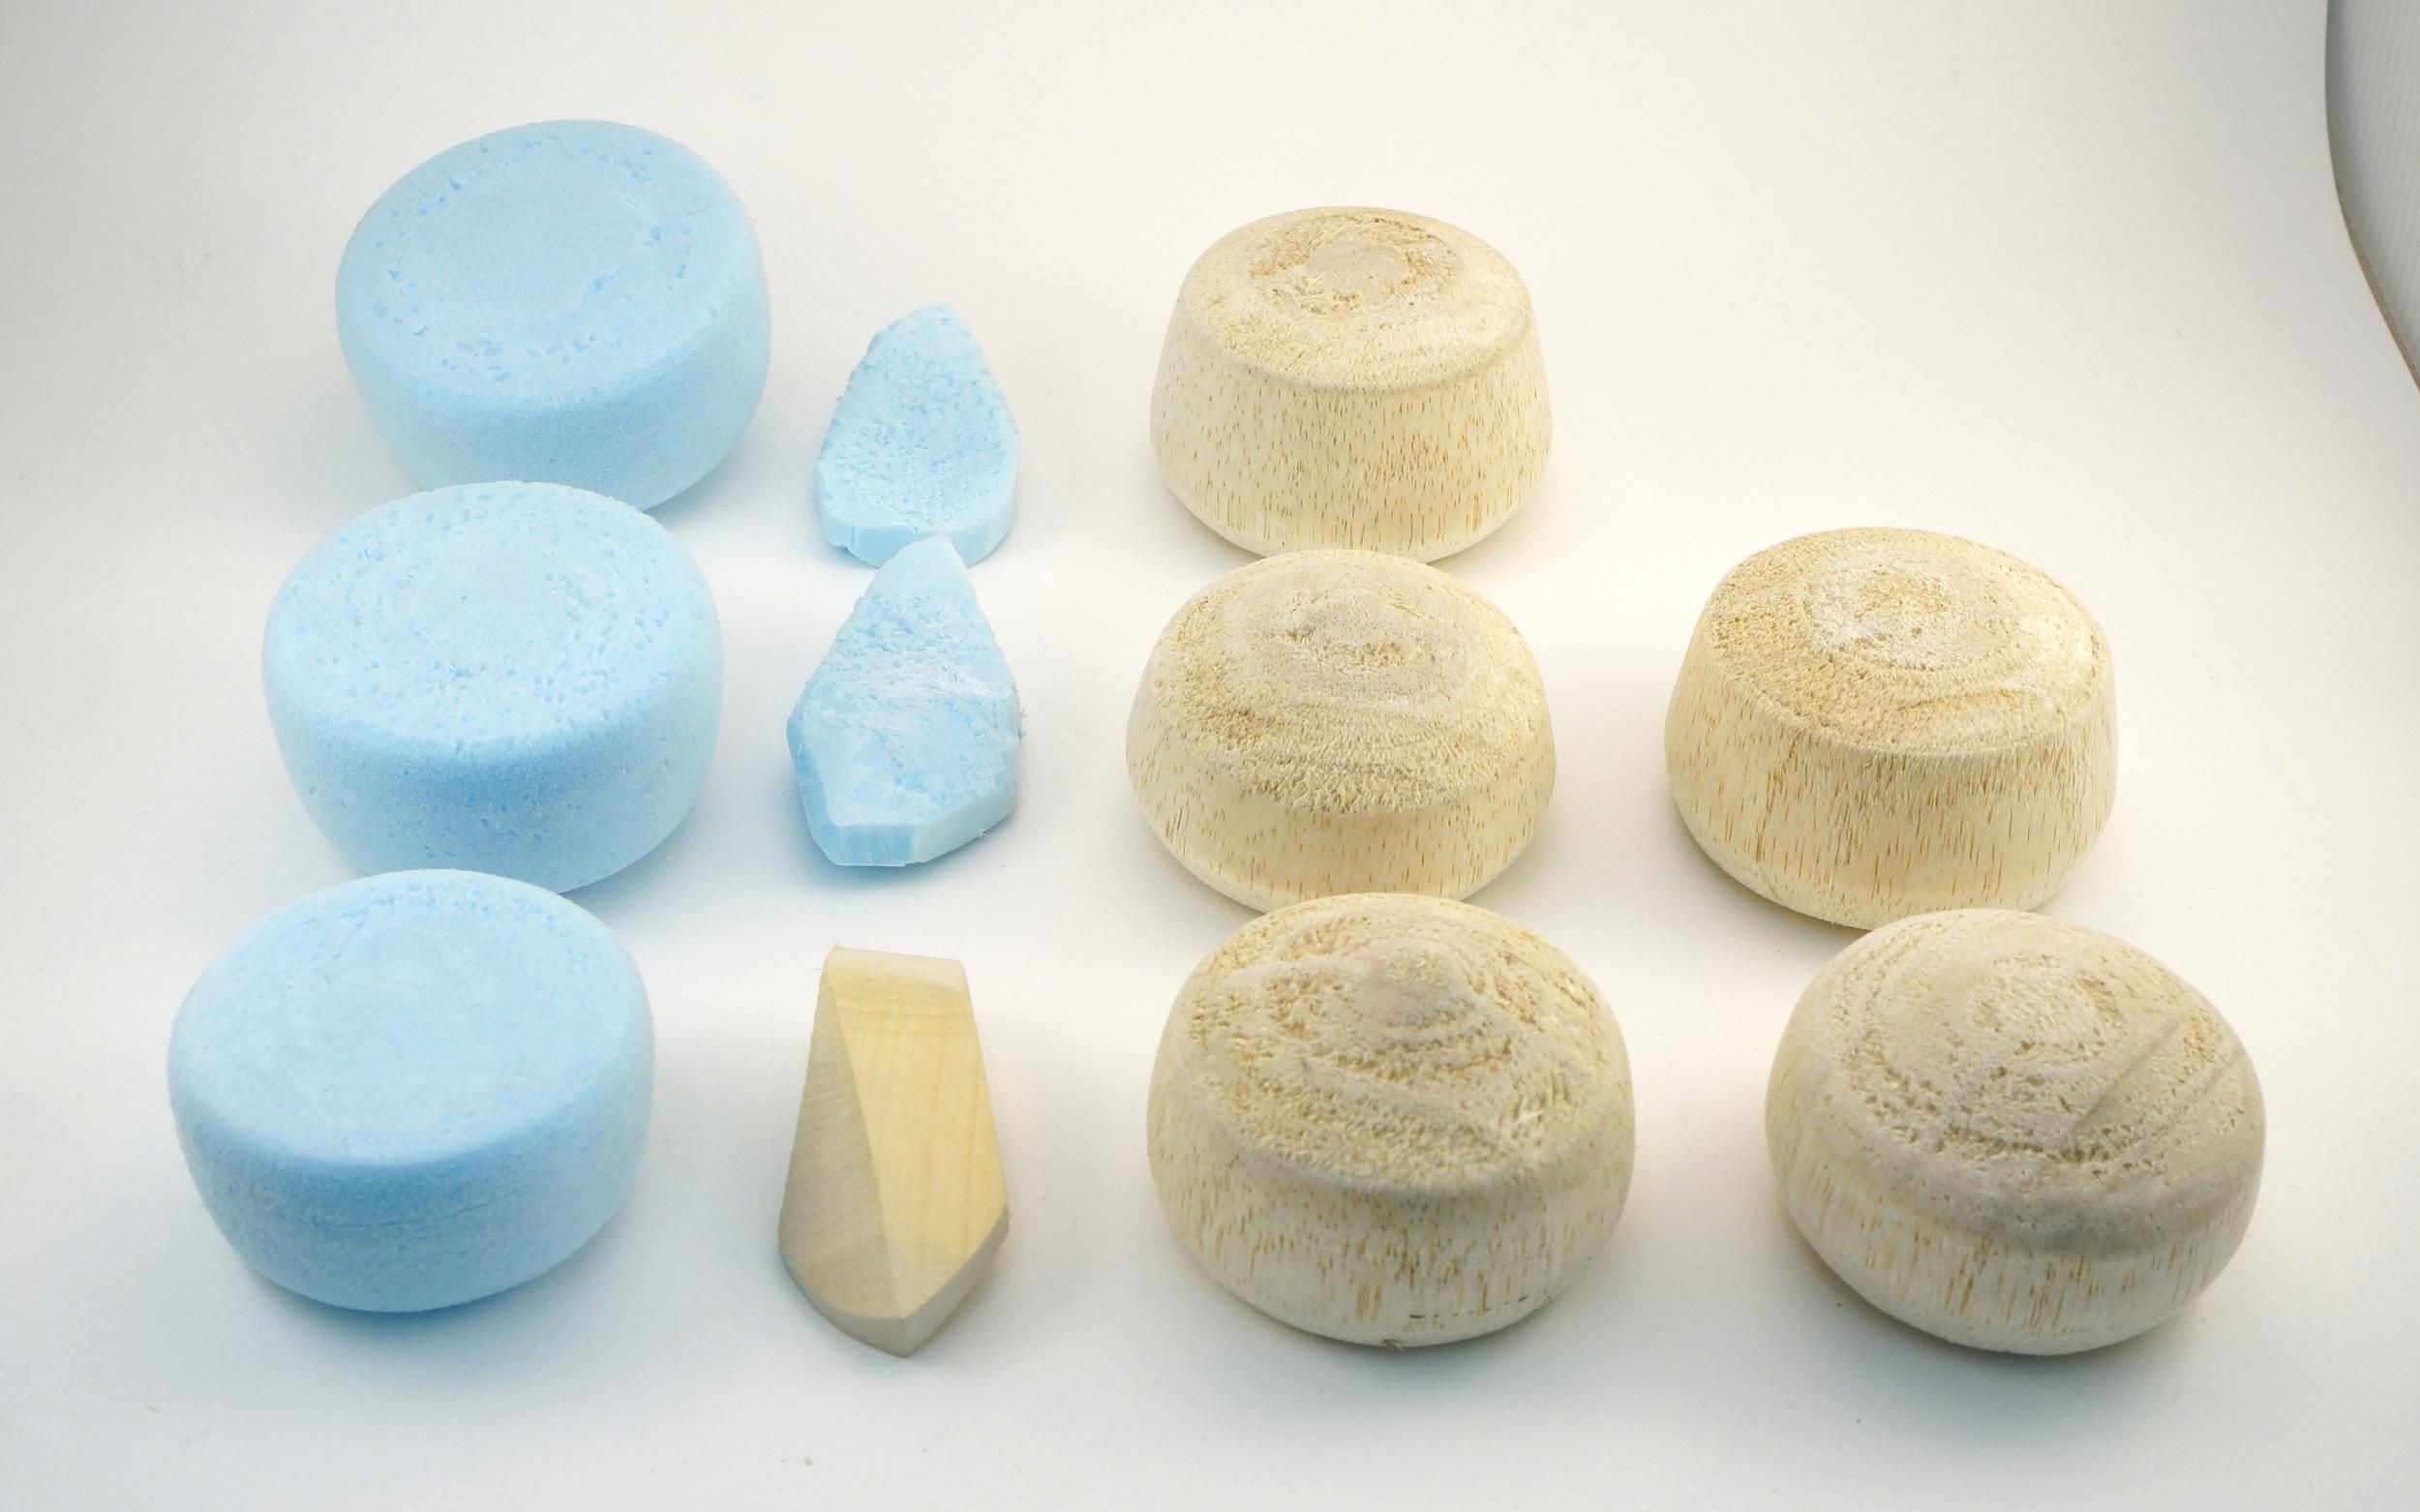 turnip models 2.jpg